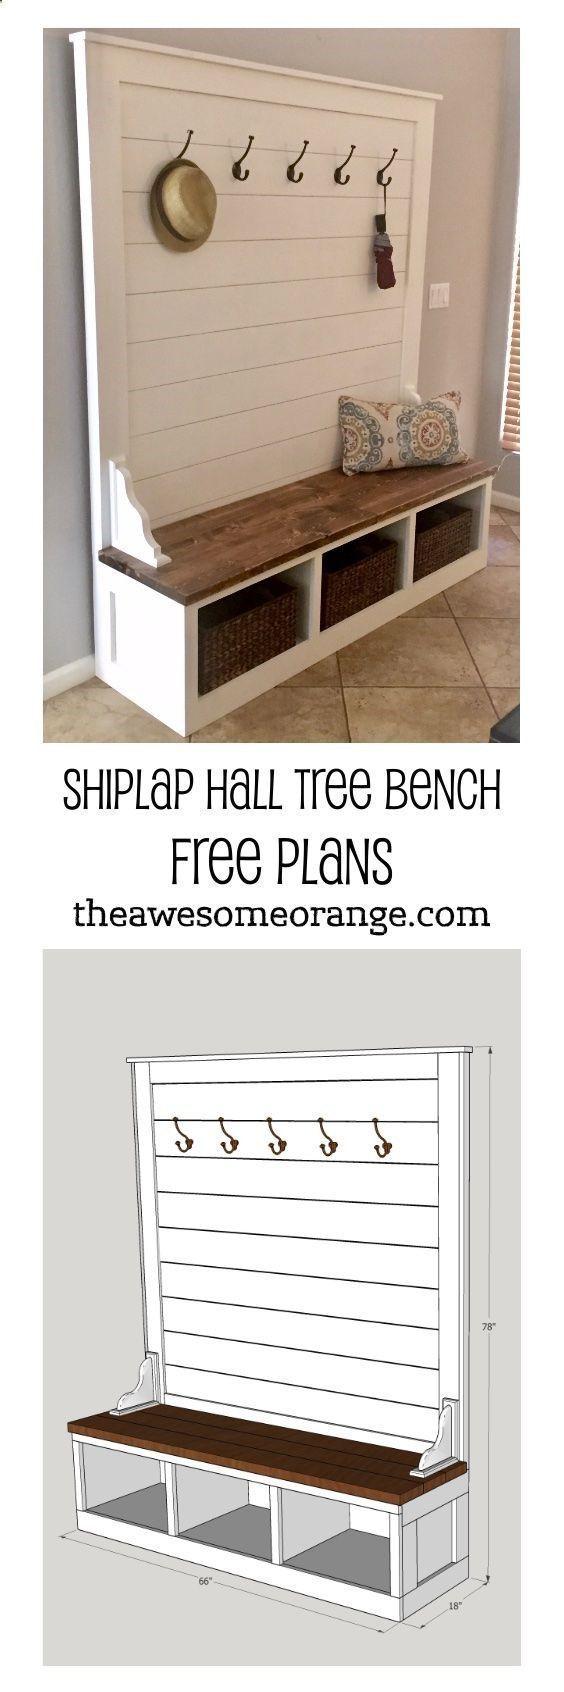 Junior hallway ideas  Most Creative Simple DIY Wooden Pallet Furniture Project Ideas  DIY